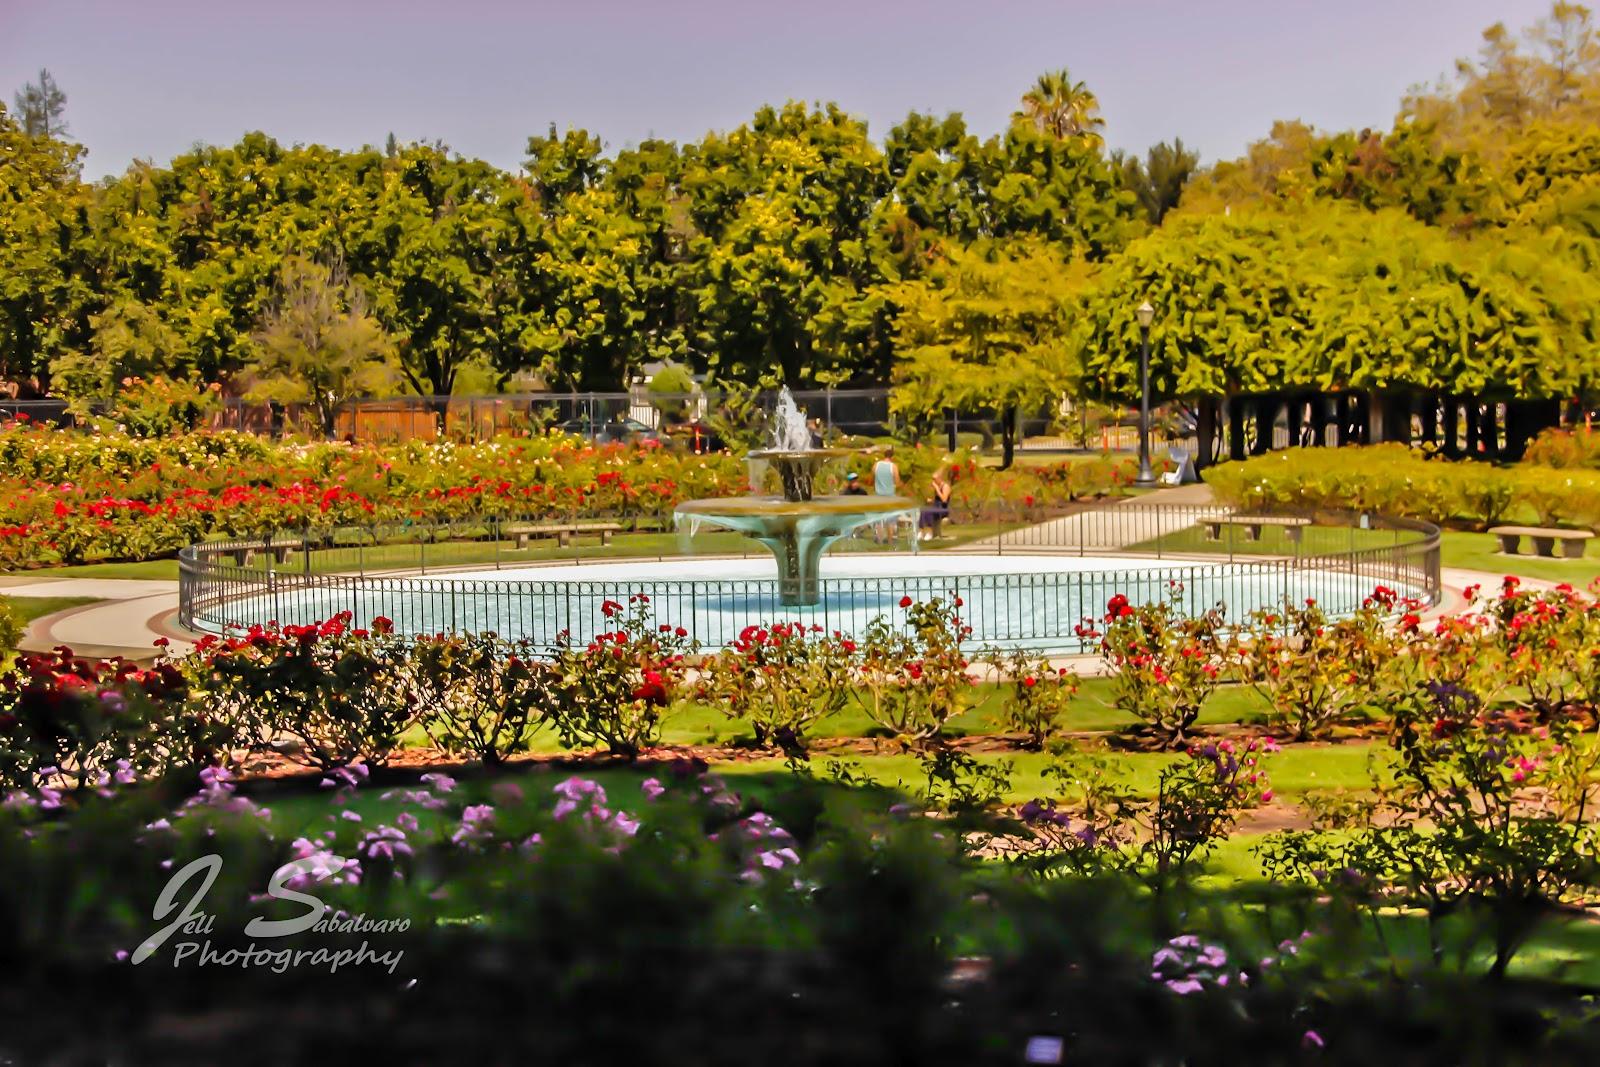 Jell Sabalvaro Photography Municipal Rose Garden San